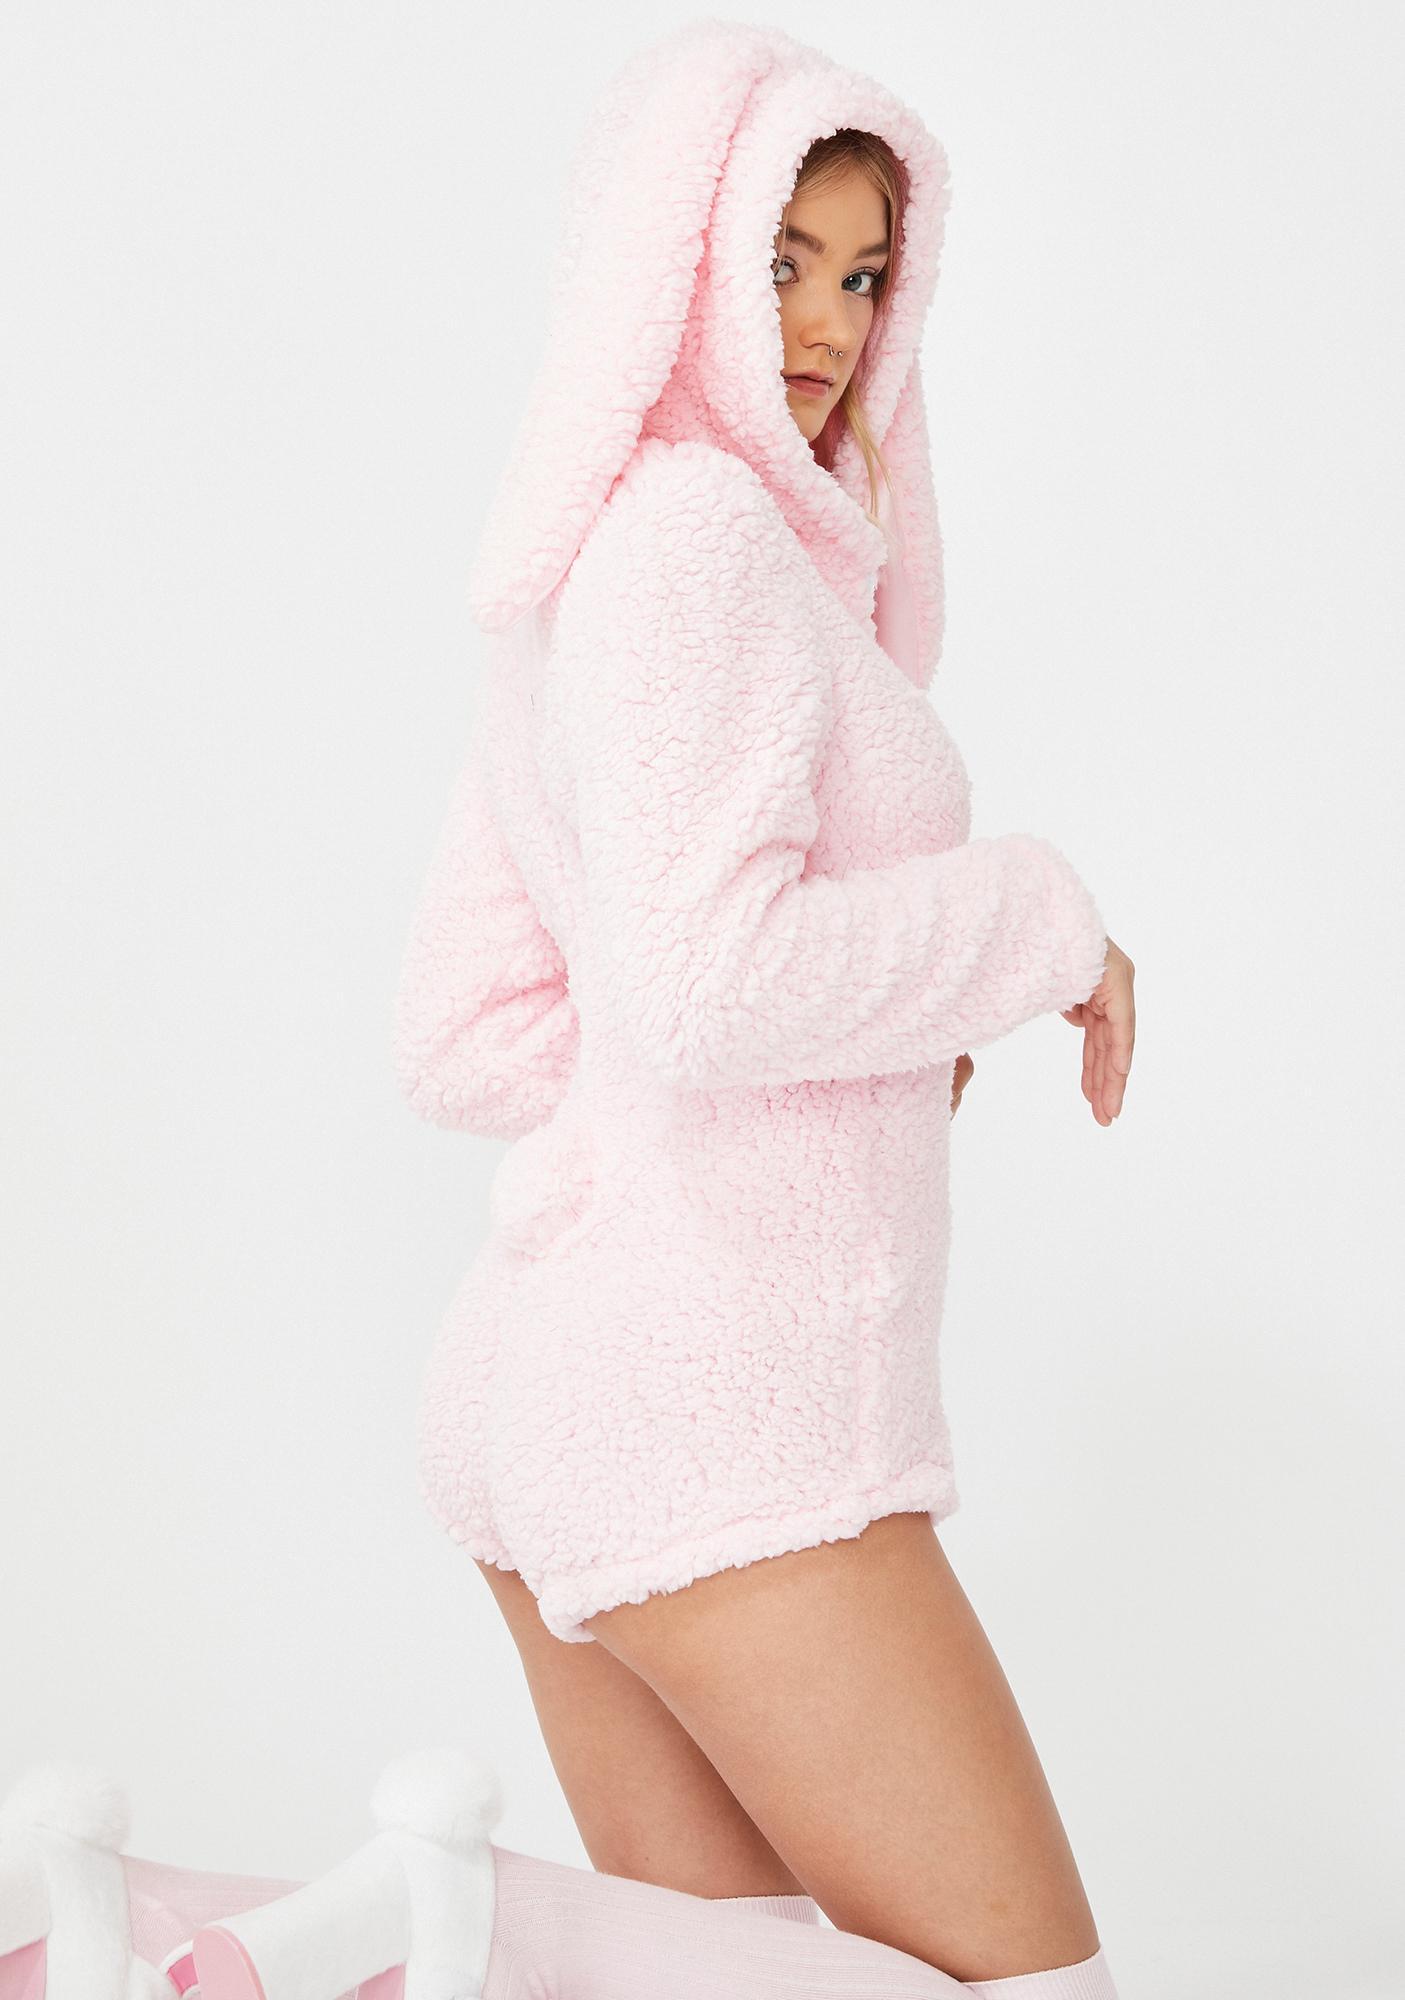 Cuddly Creature Bunny Costume